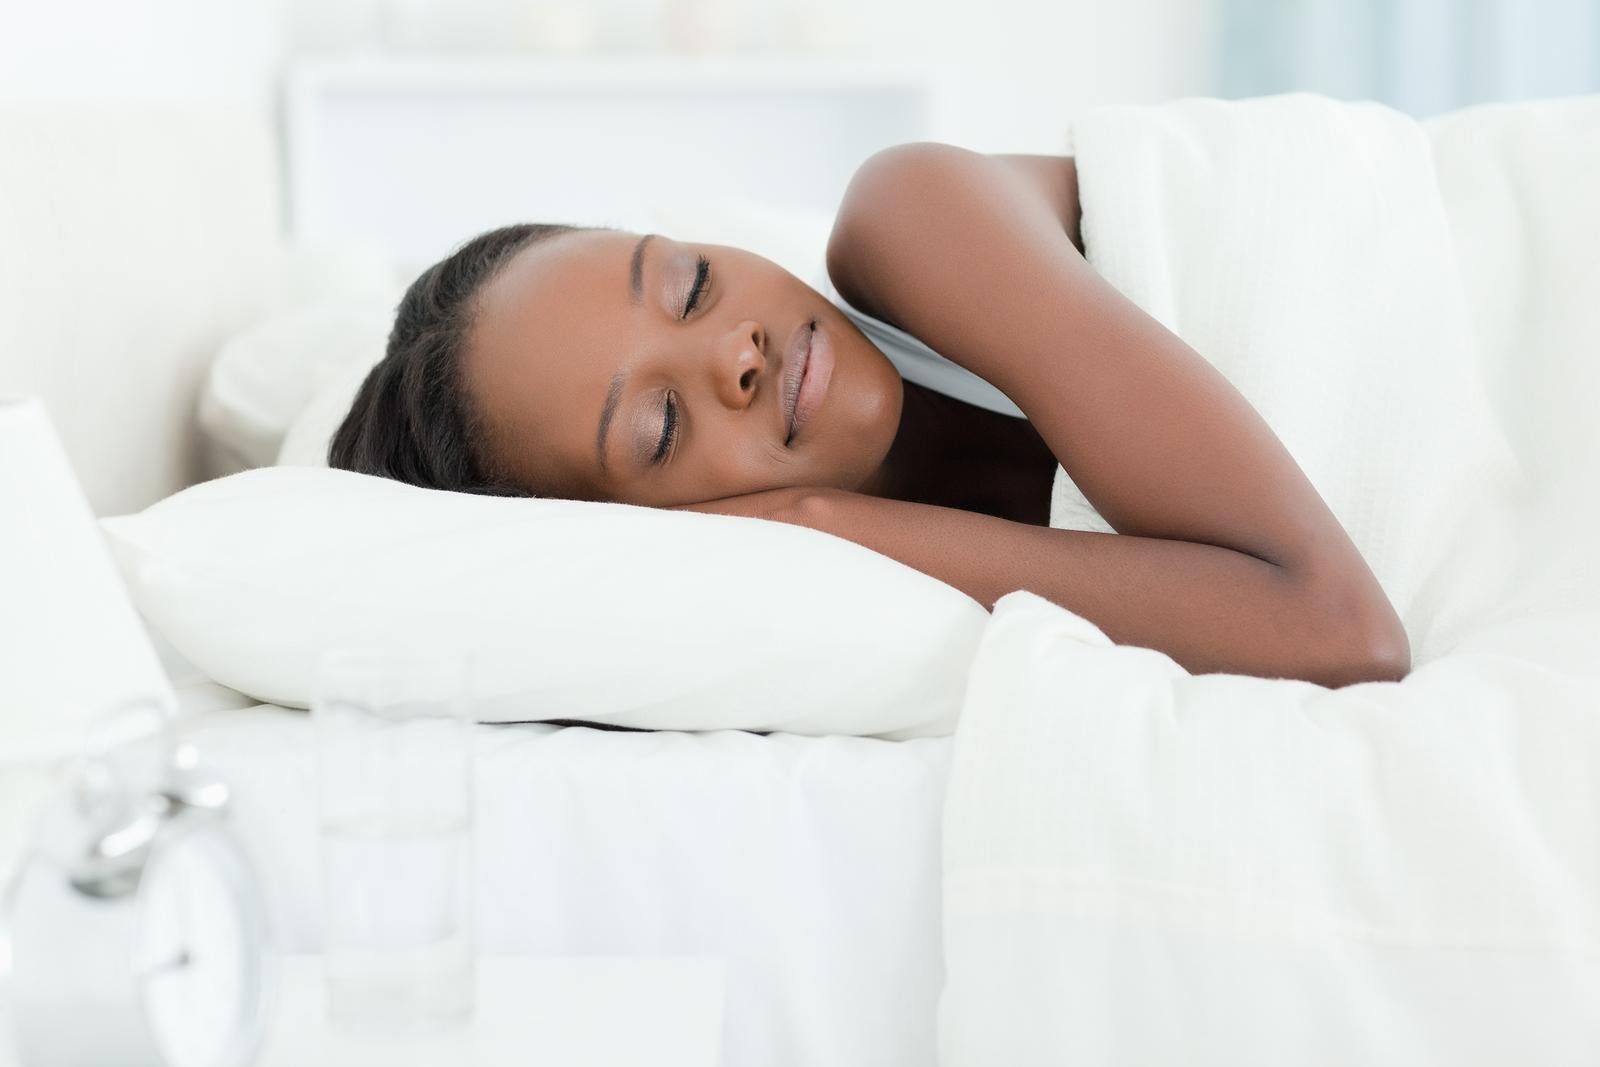 bgg2wl-woman-sleeping.jpg